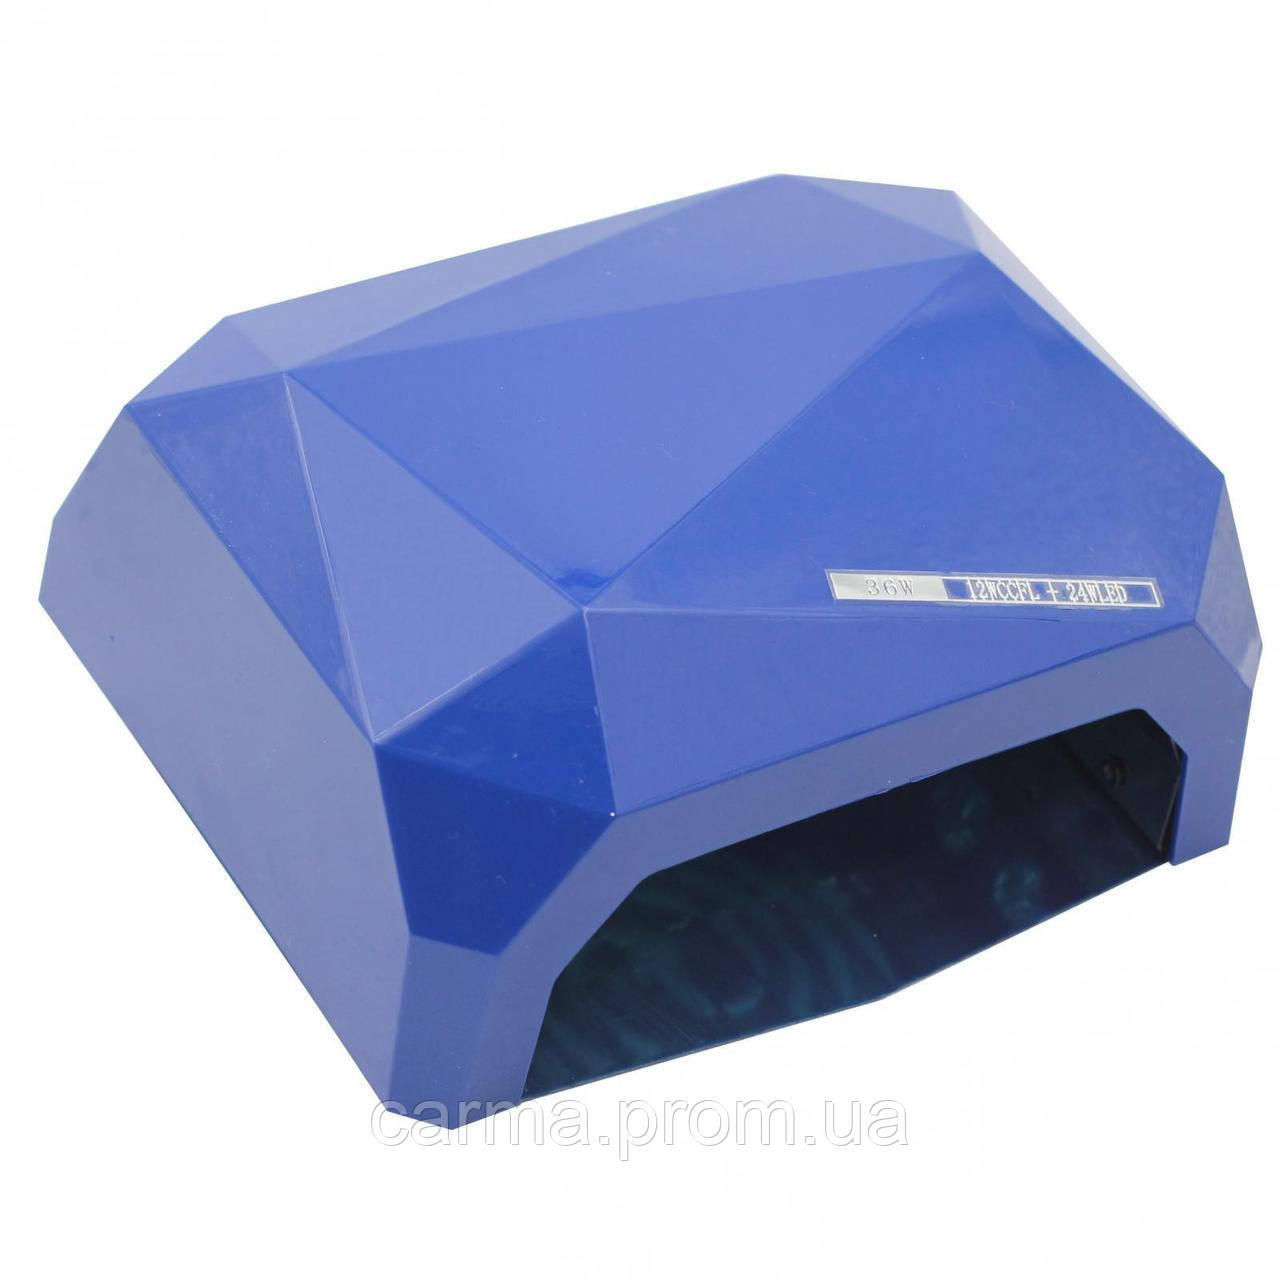 Лампа для маникюра гибридная DIAMOND CCFL+LED 36W Синяя